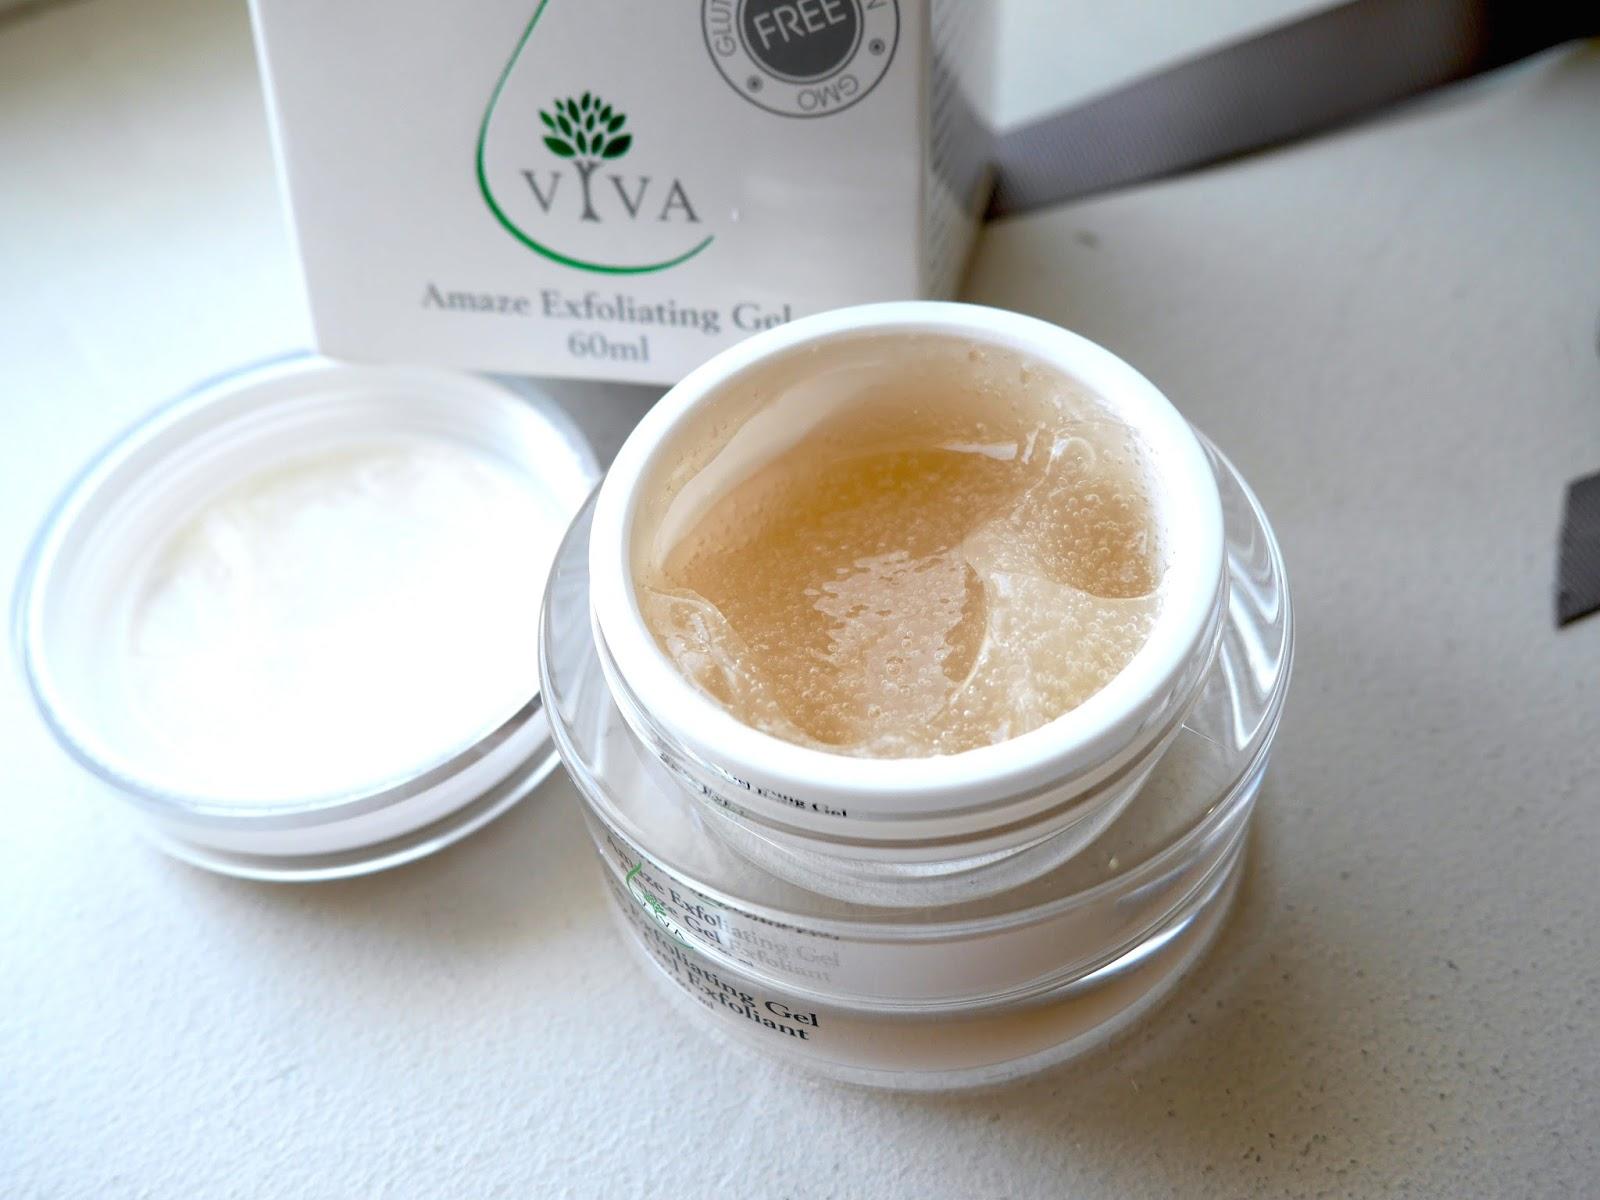 viva health skincare amaze exfoliating gel review